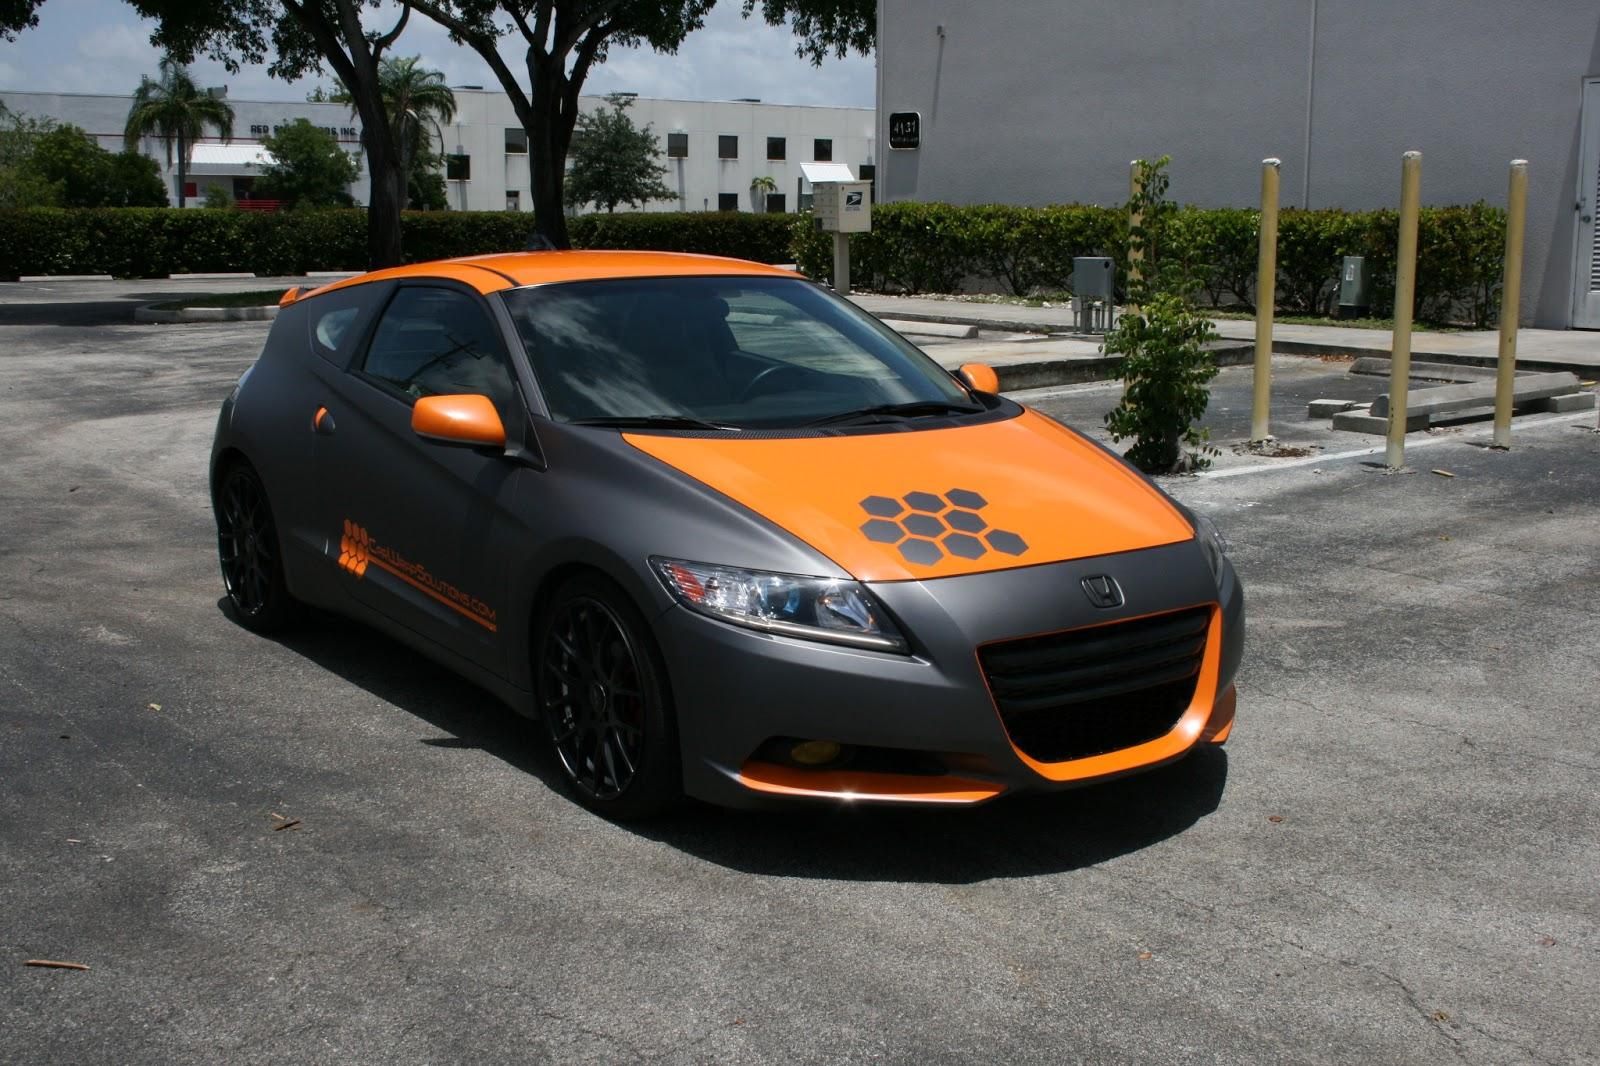 honda custom crz wrap matte cars miami silver race vinyl vehicle racing orange wraps grey florida carbon fiber stripe 3m